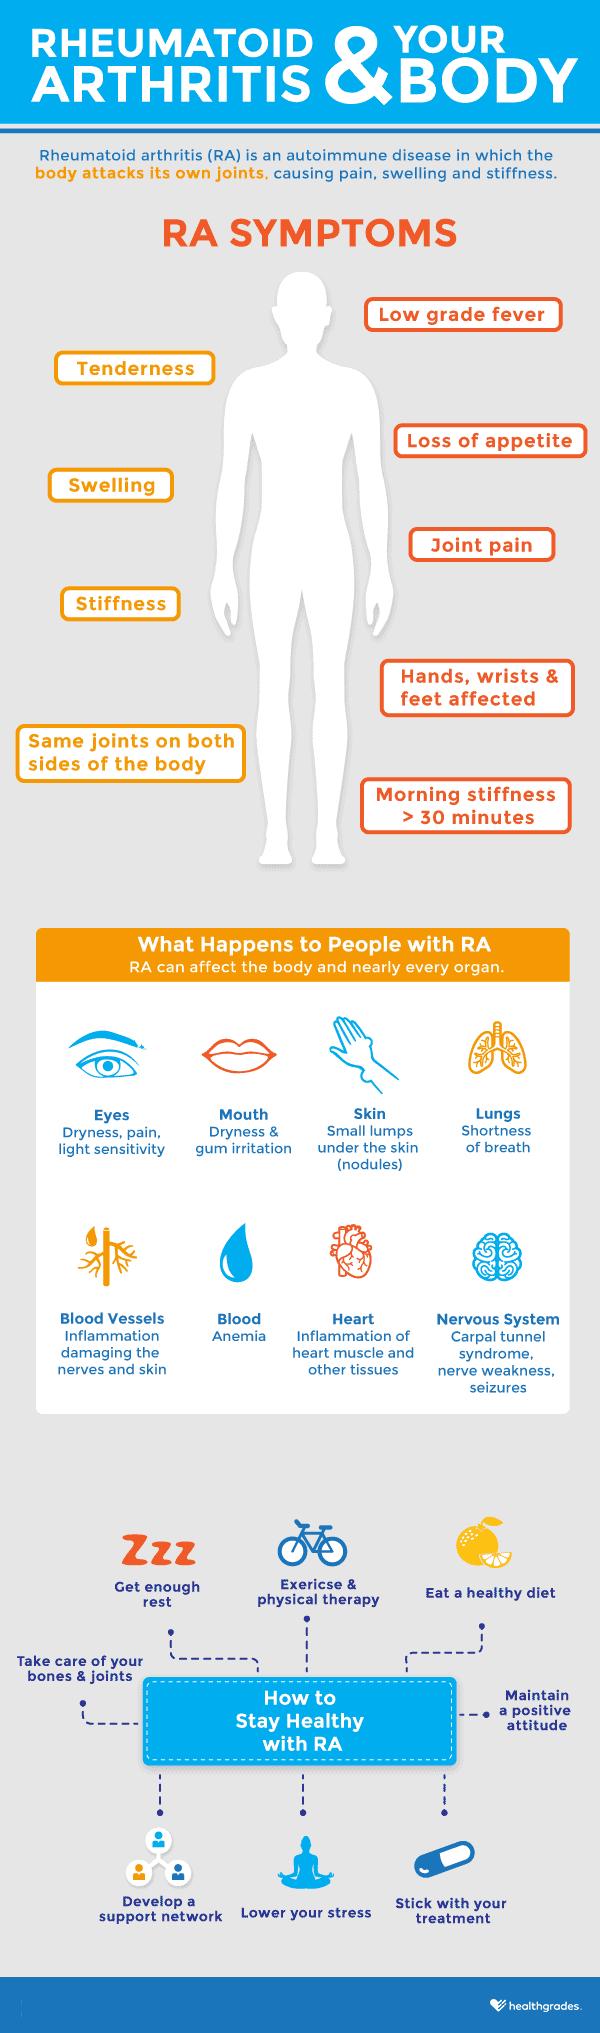 Rheumatoid Arthritis and Your Body